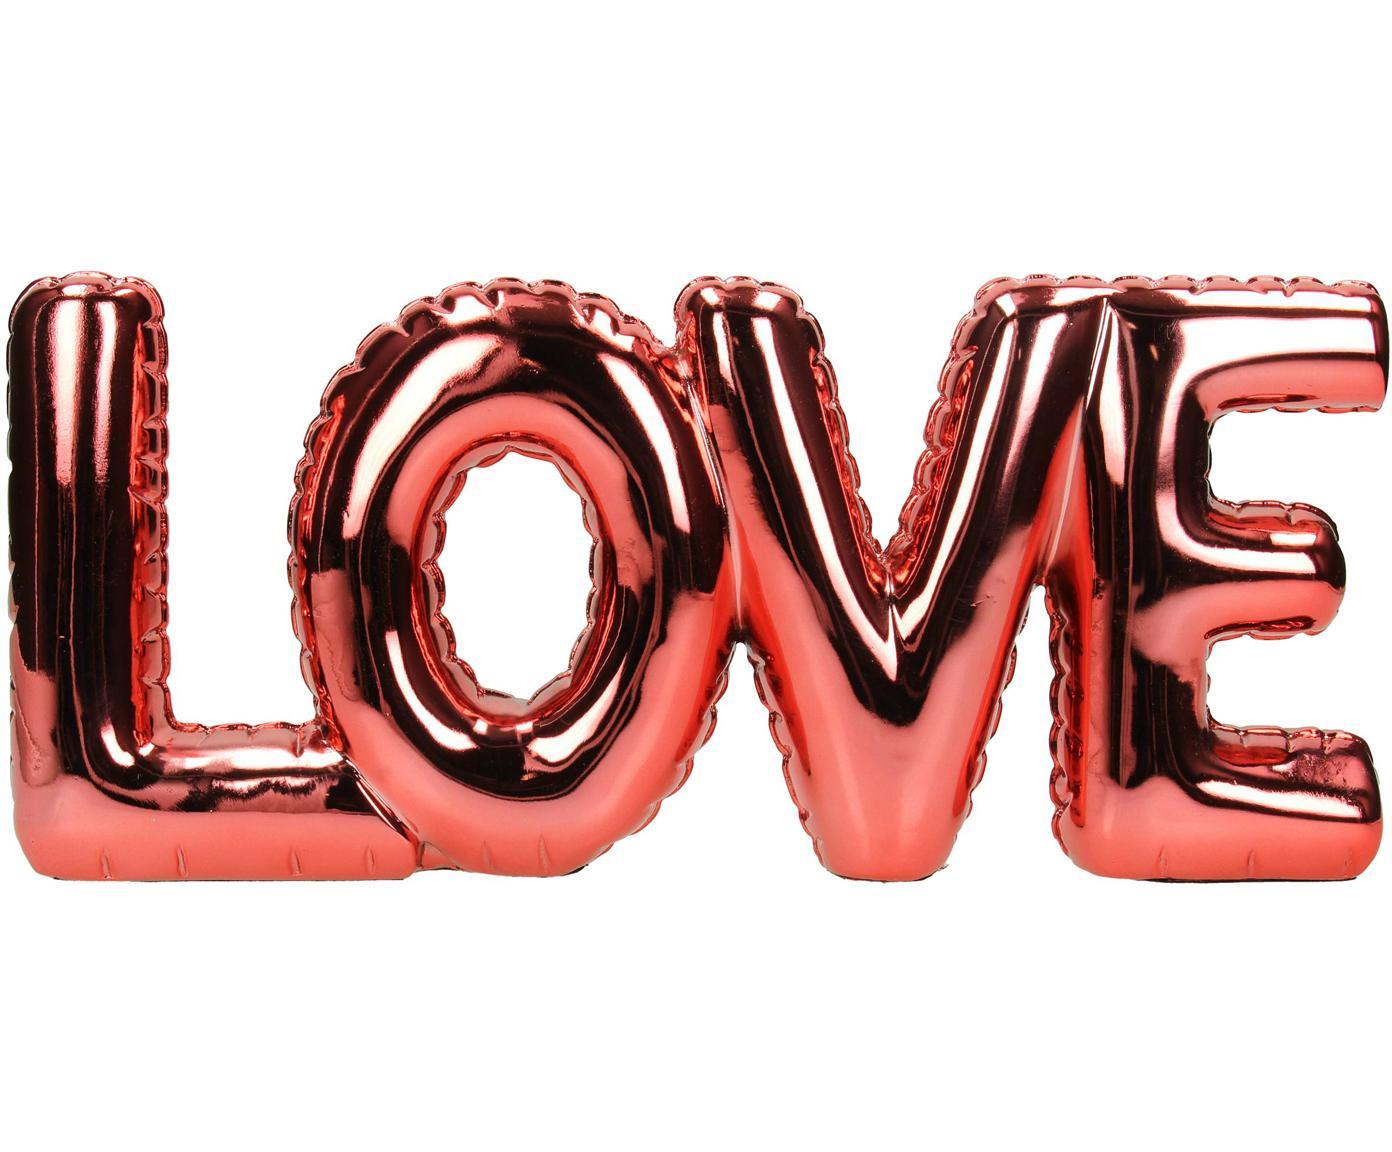 Oggetto decorativo Love, Poliresina, Rosso, lucido, Larg. 32 x Alt. 14 cm